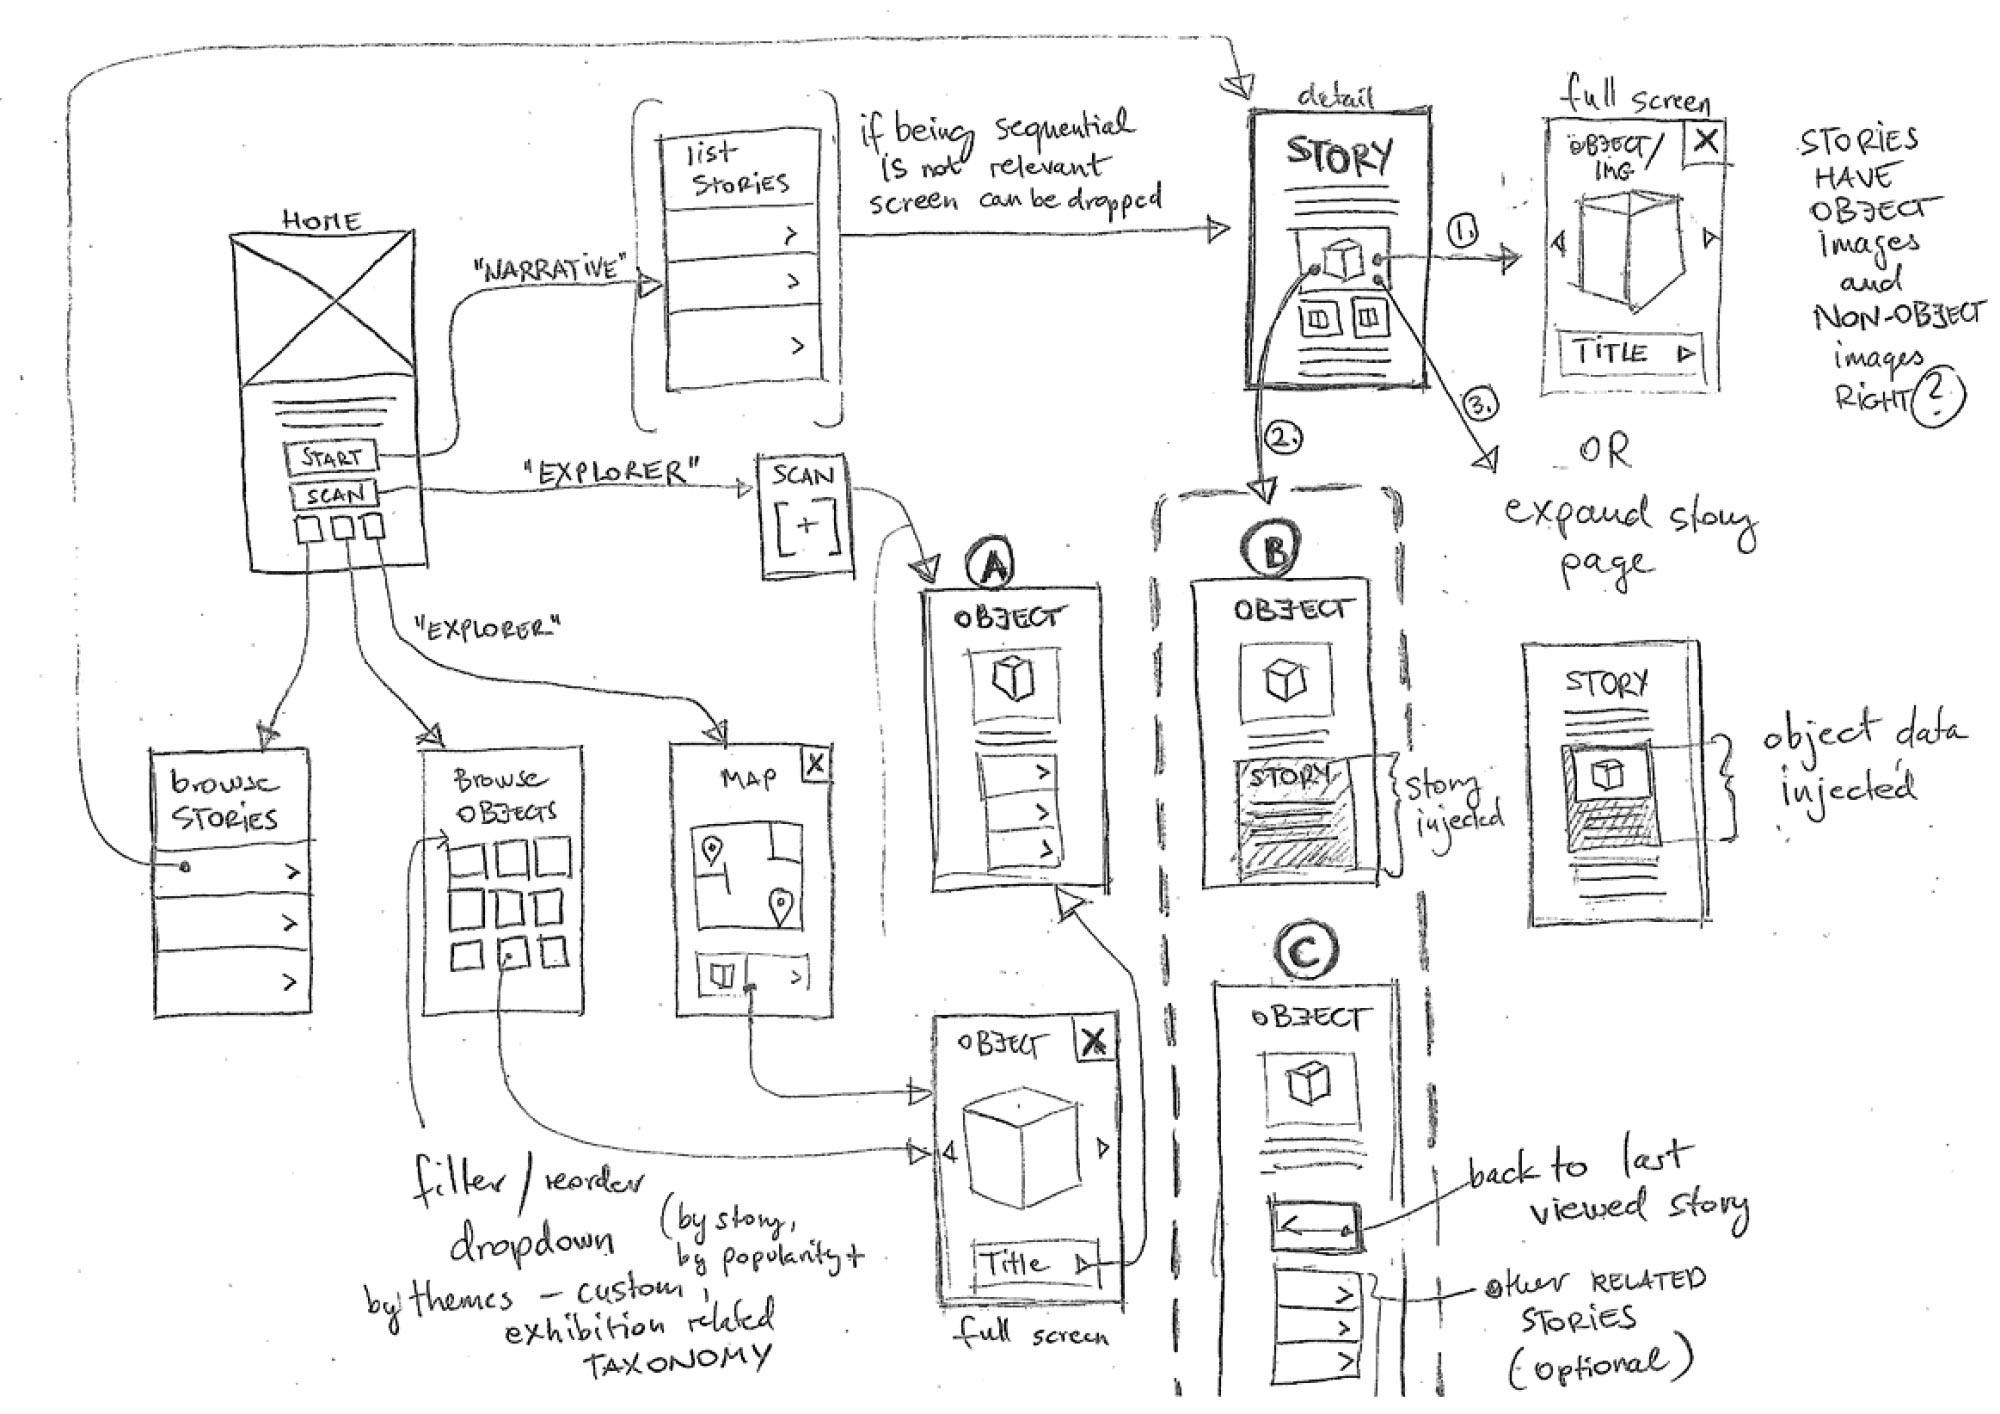 Museum collections and mobile interpretation james watt prototype webapp flowchart sketch ver1g ccuart Image collections